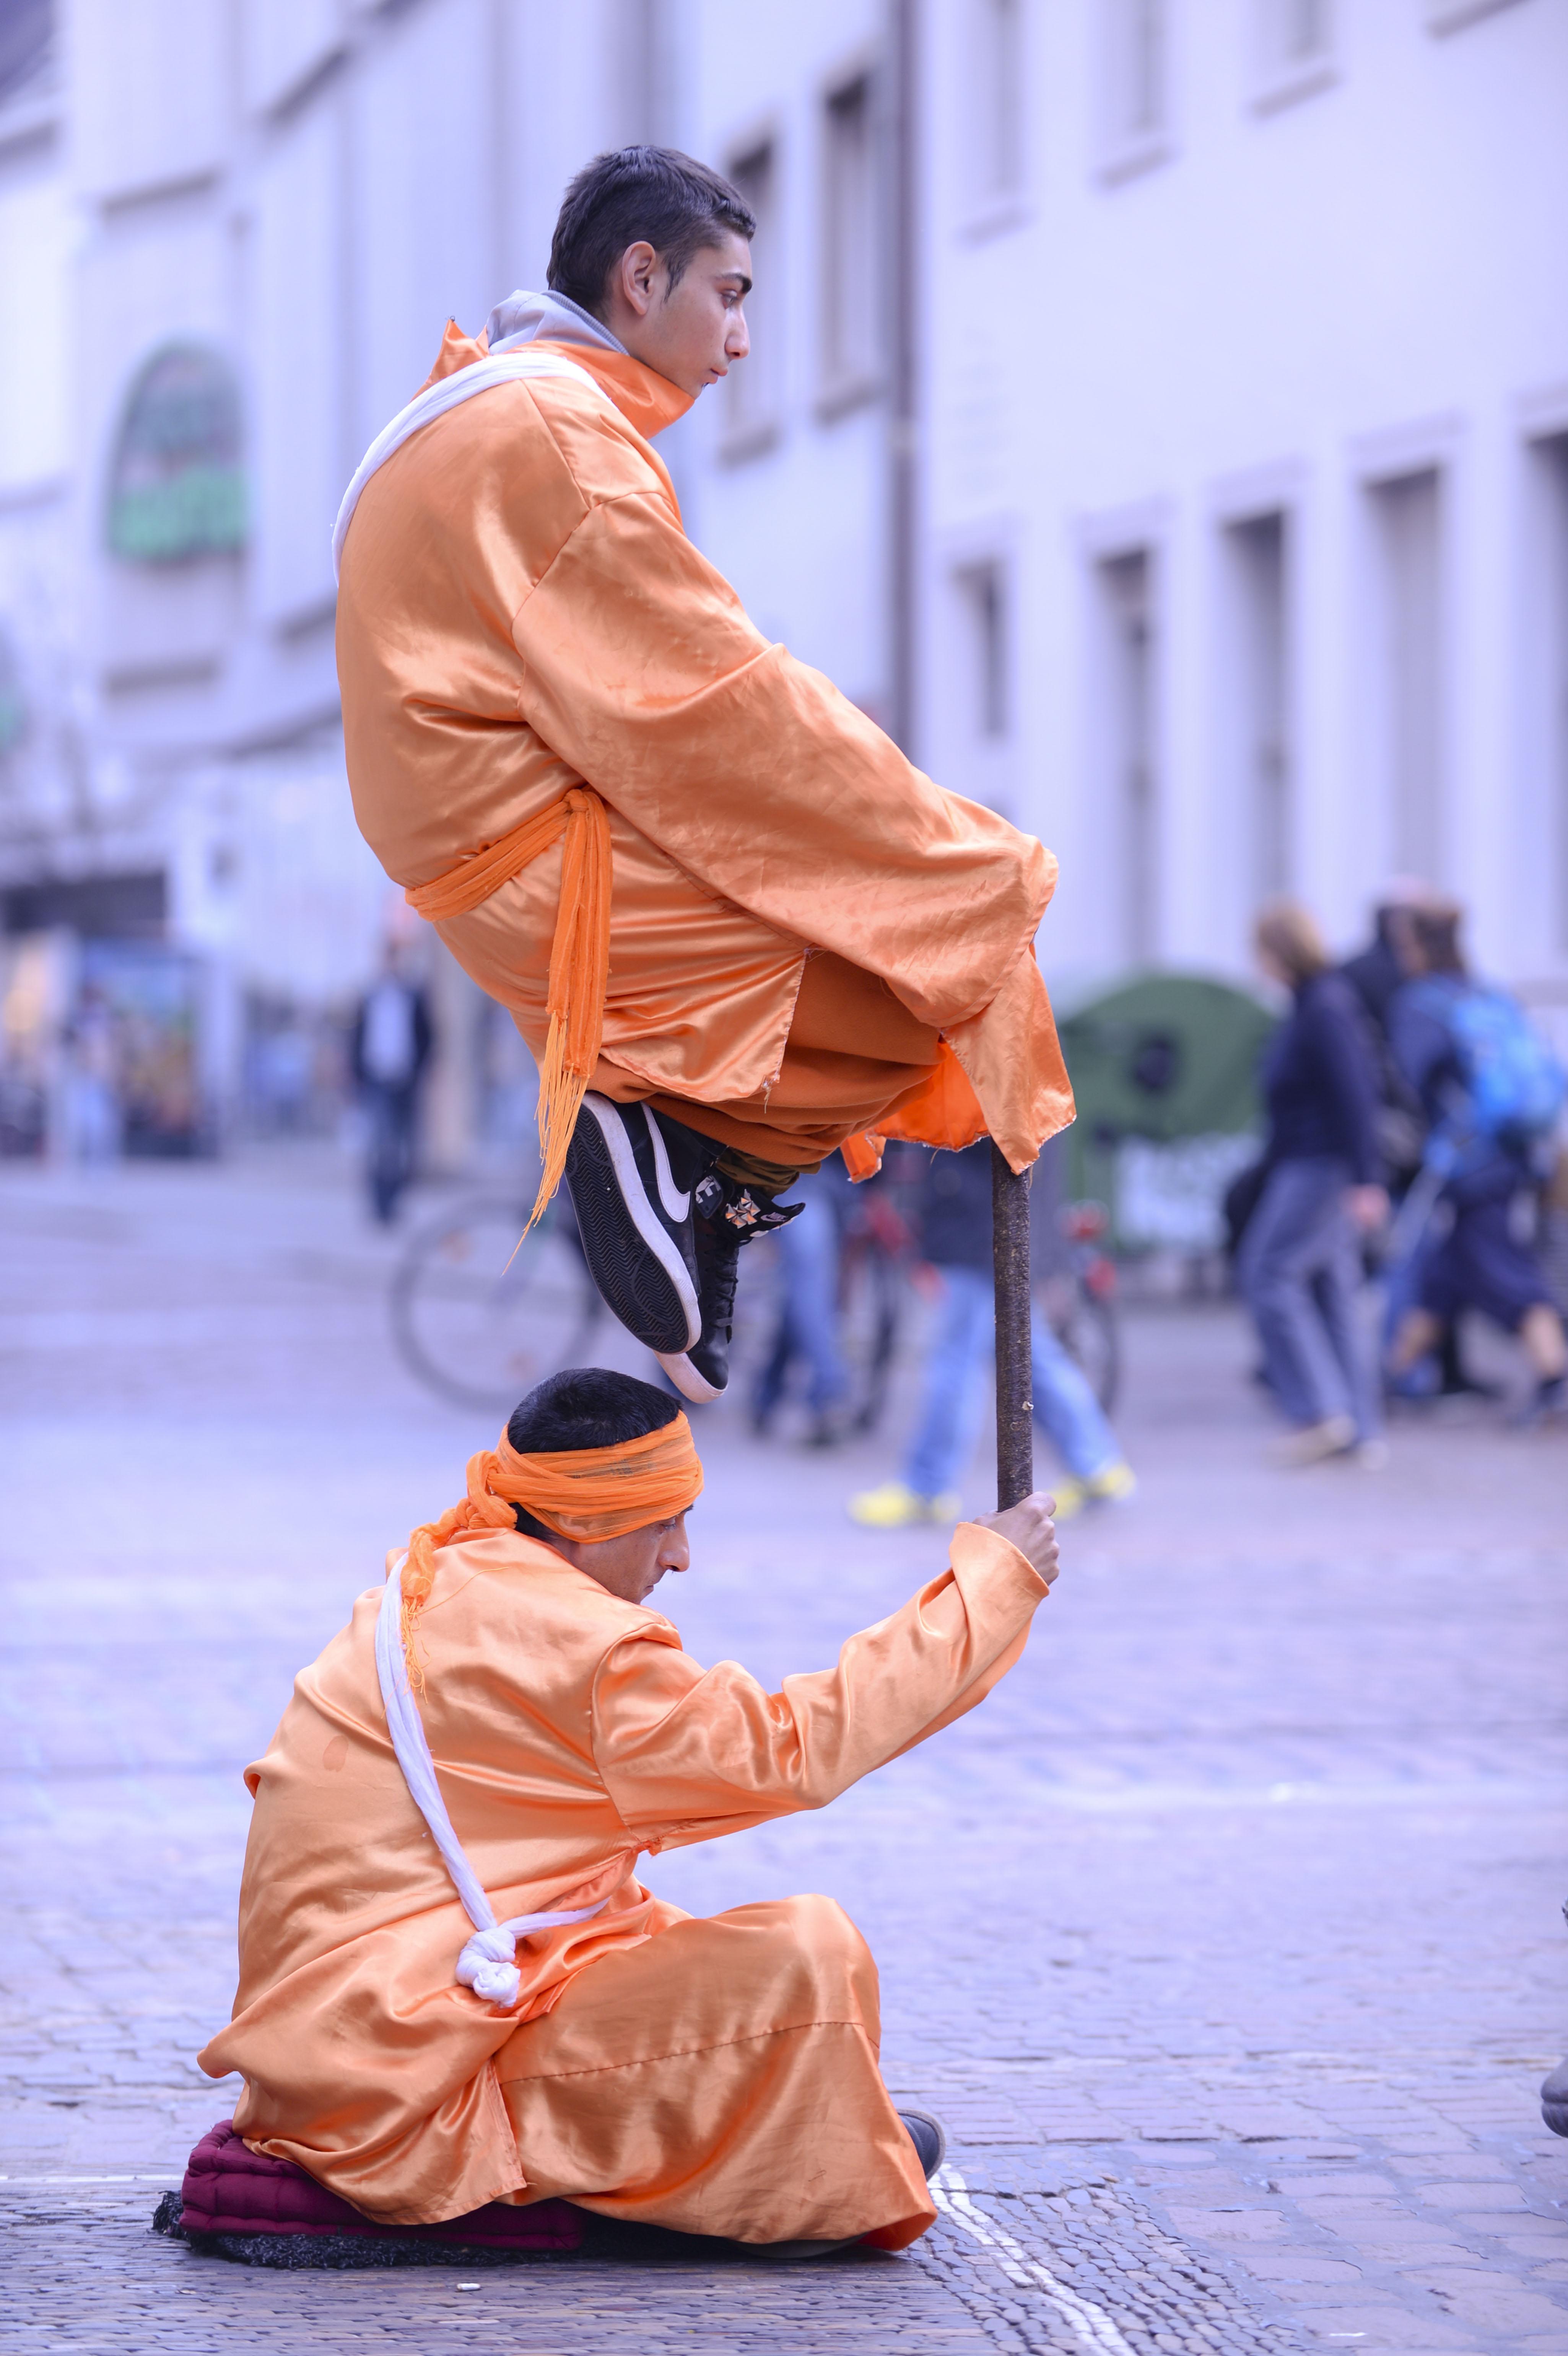 Balance ©Johannes Ratermann